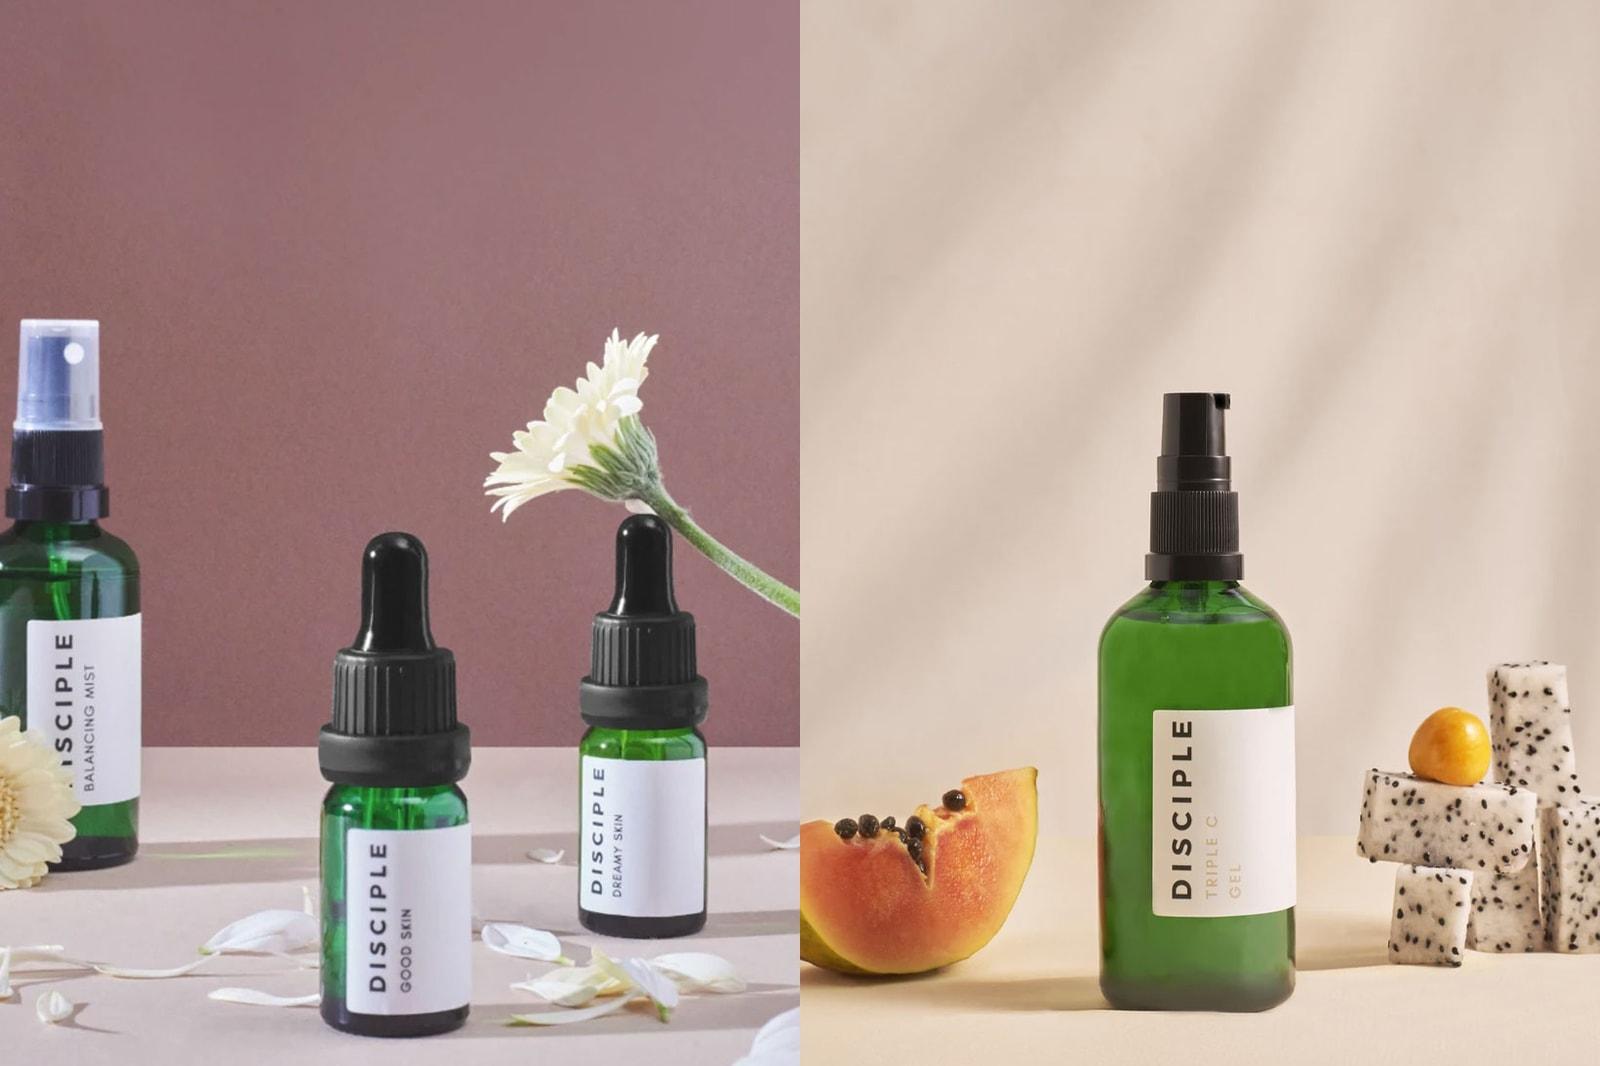 disciple skincare london face mist serum moisturization hydration